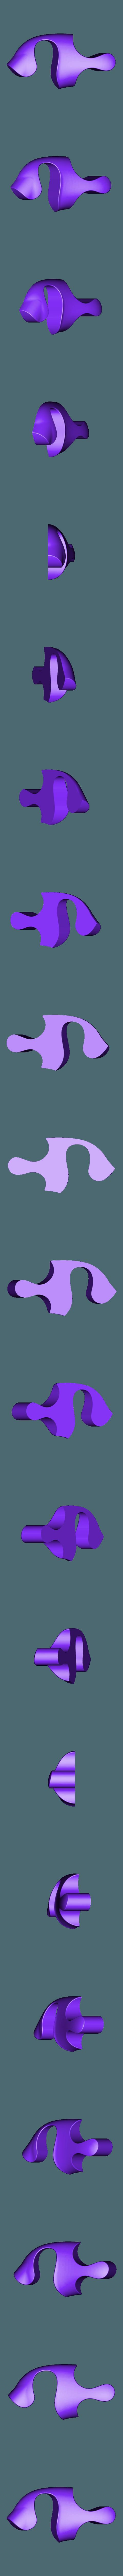 Jigsaw Cow Body.stl Download free STL file Jigsaw Cow • 3D printing model, FerryTeacher